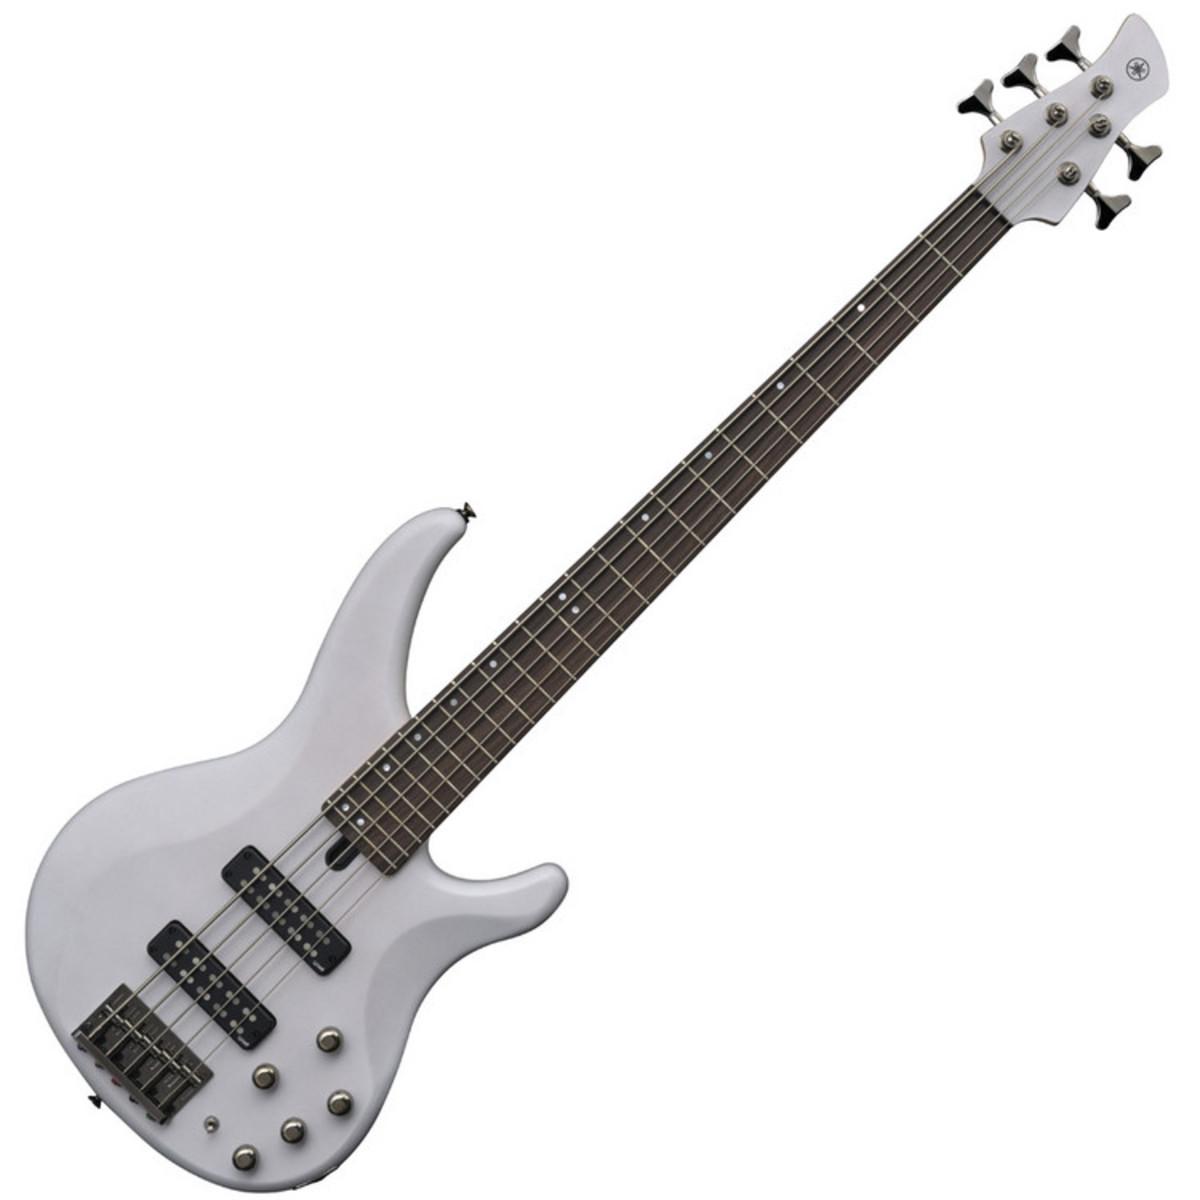 yamaha trbx505 5 string bass guitar translucent white at. Black Bedroom Furniture Sets. Home Design Ideas